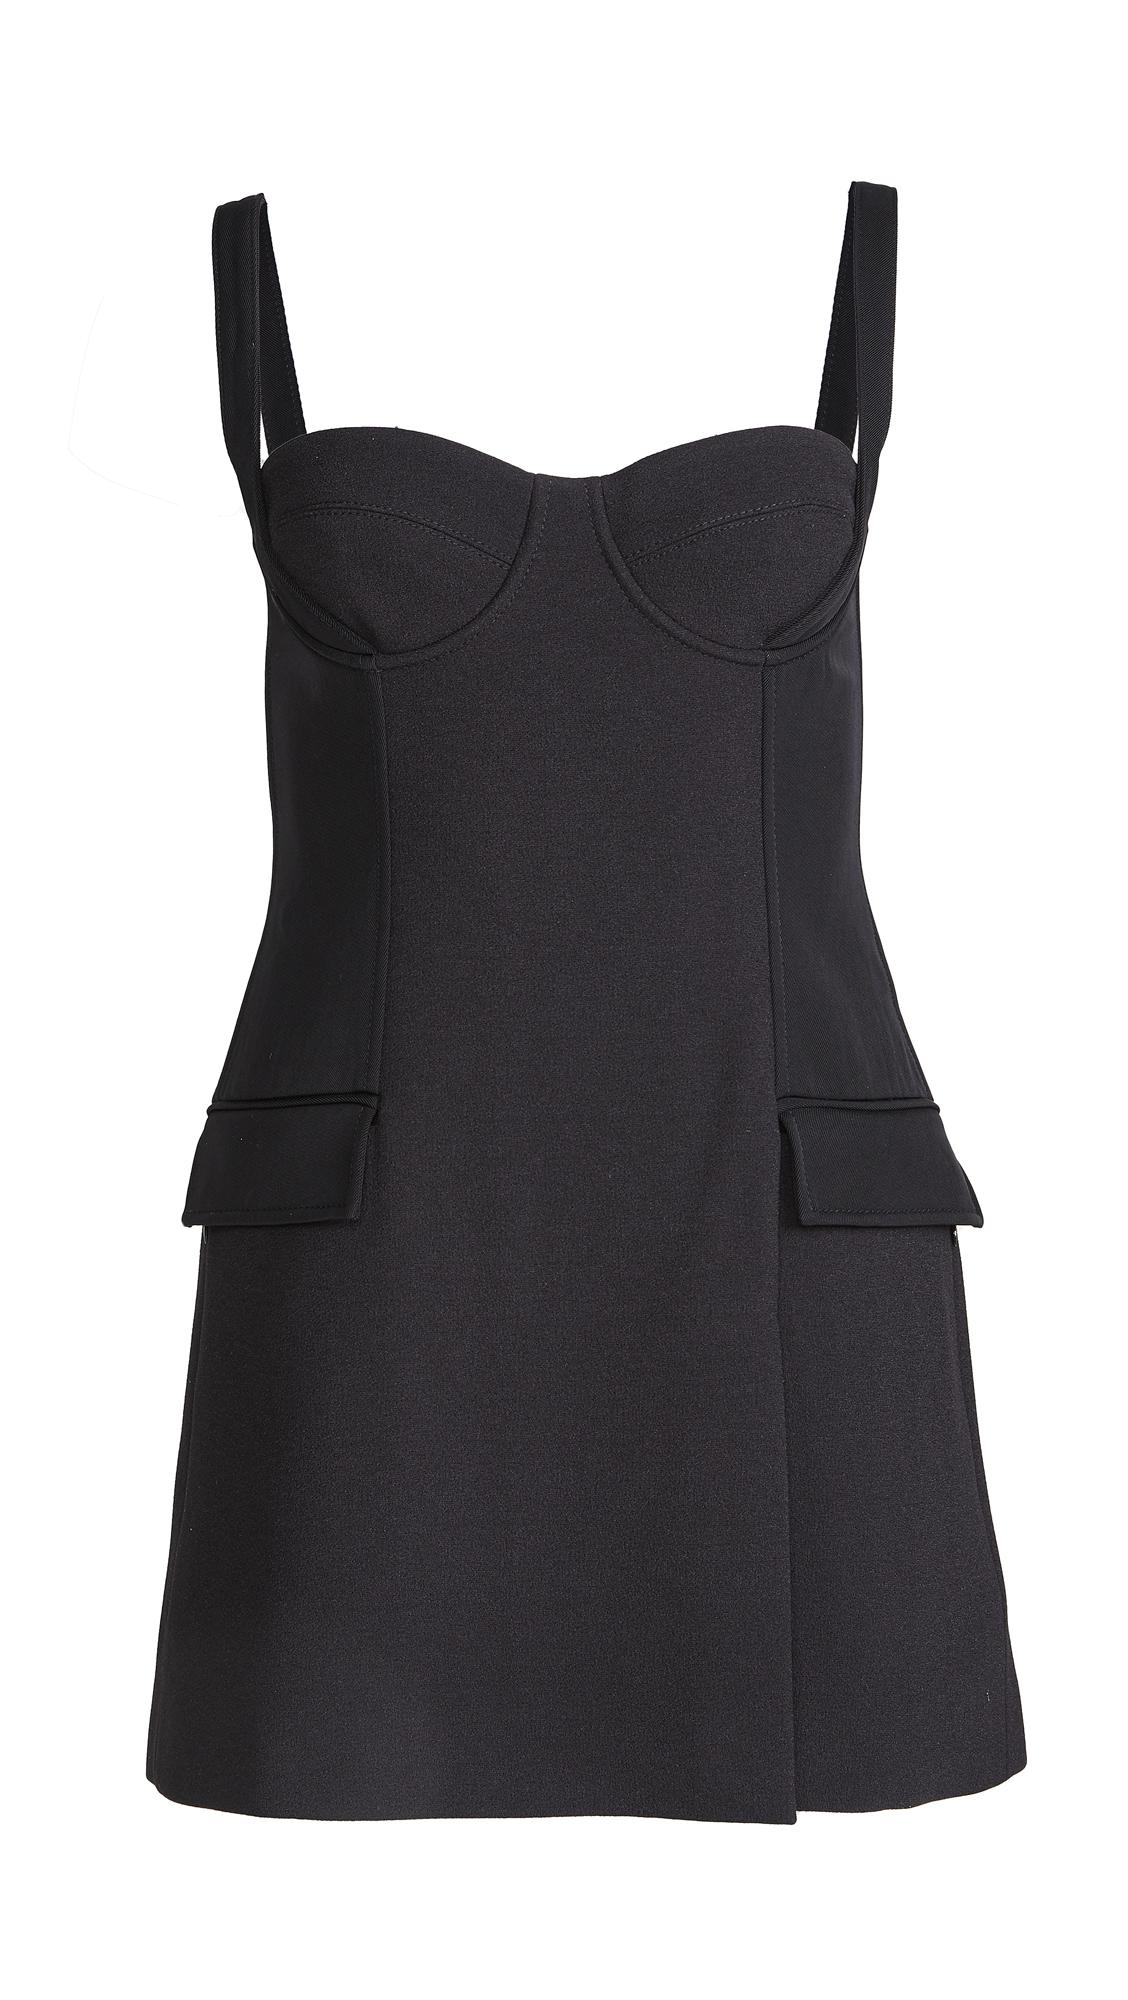 Dion Lee Belted Strap Bustier Mini Dress